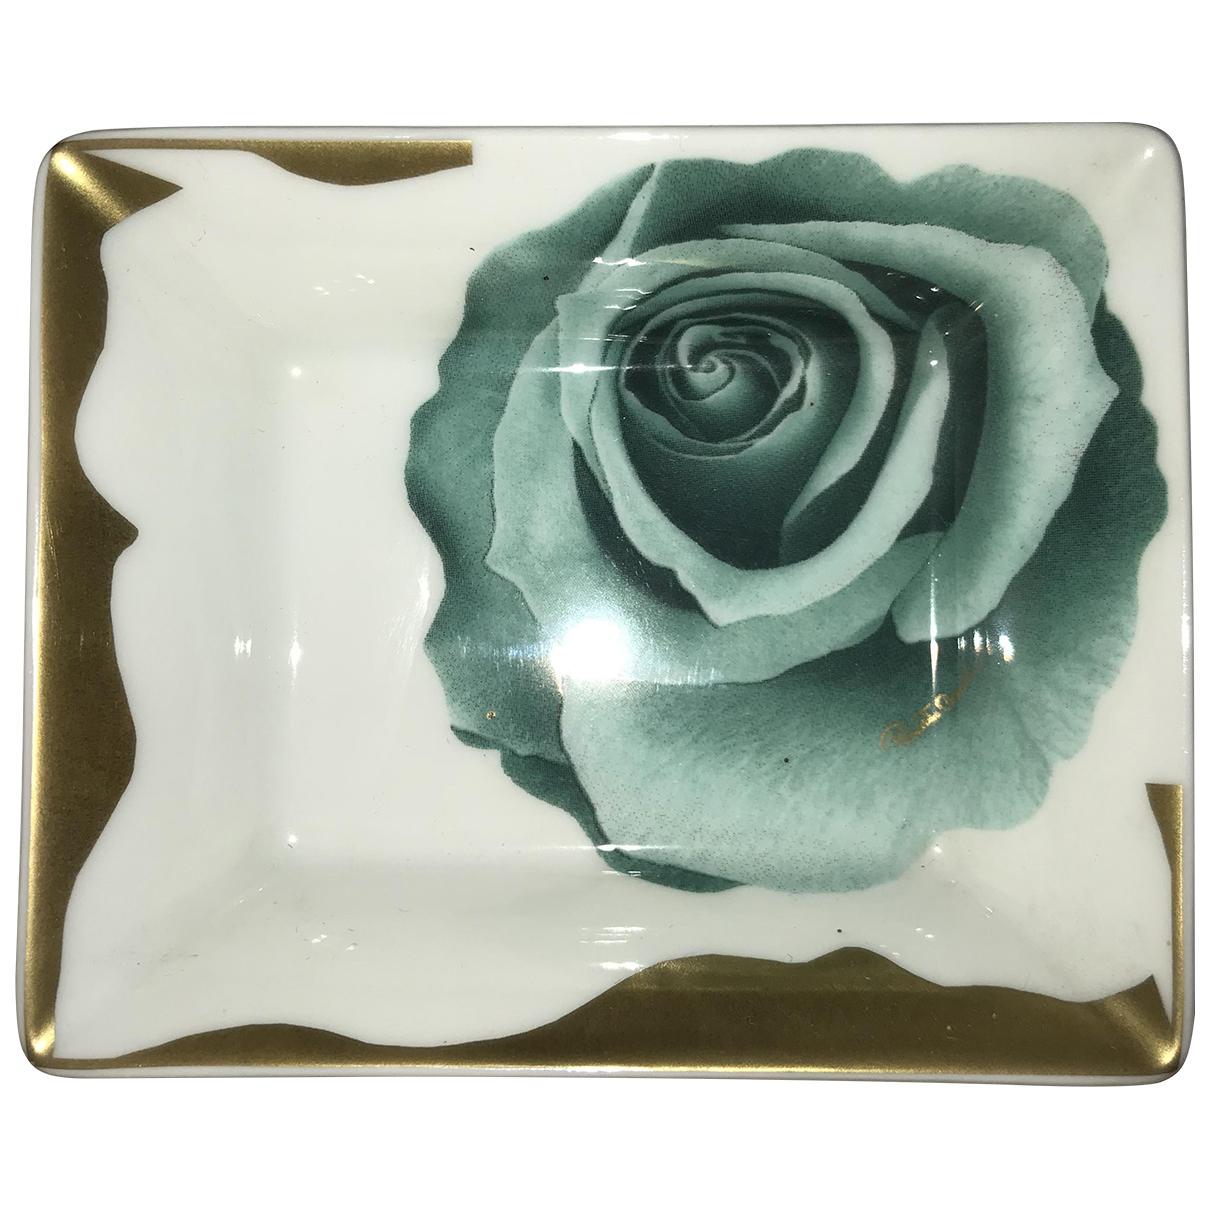 Cenicero de Porcelana Roberto Cavalli